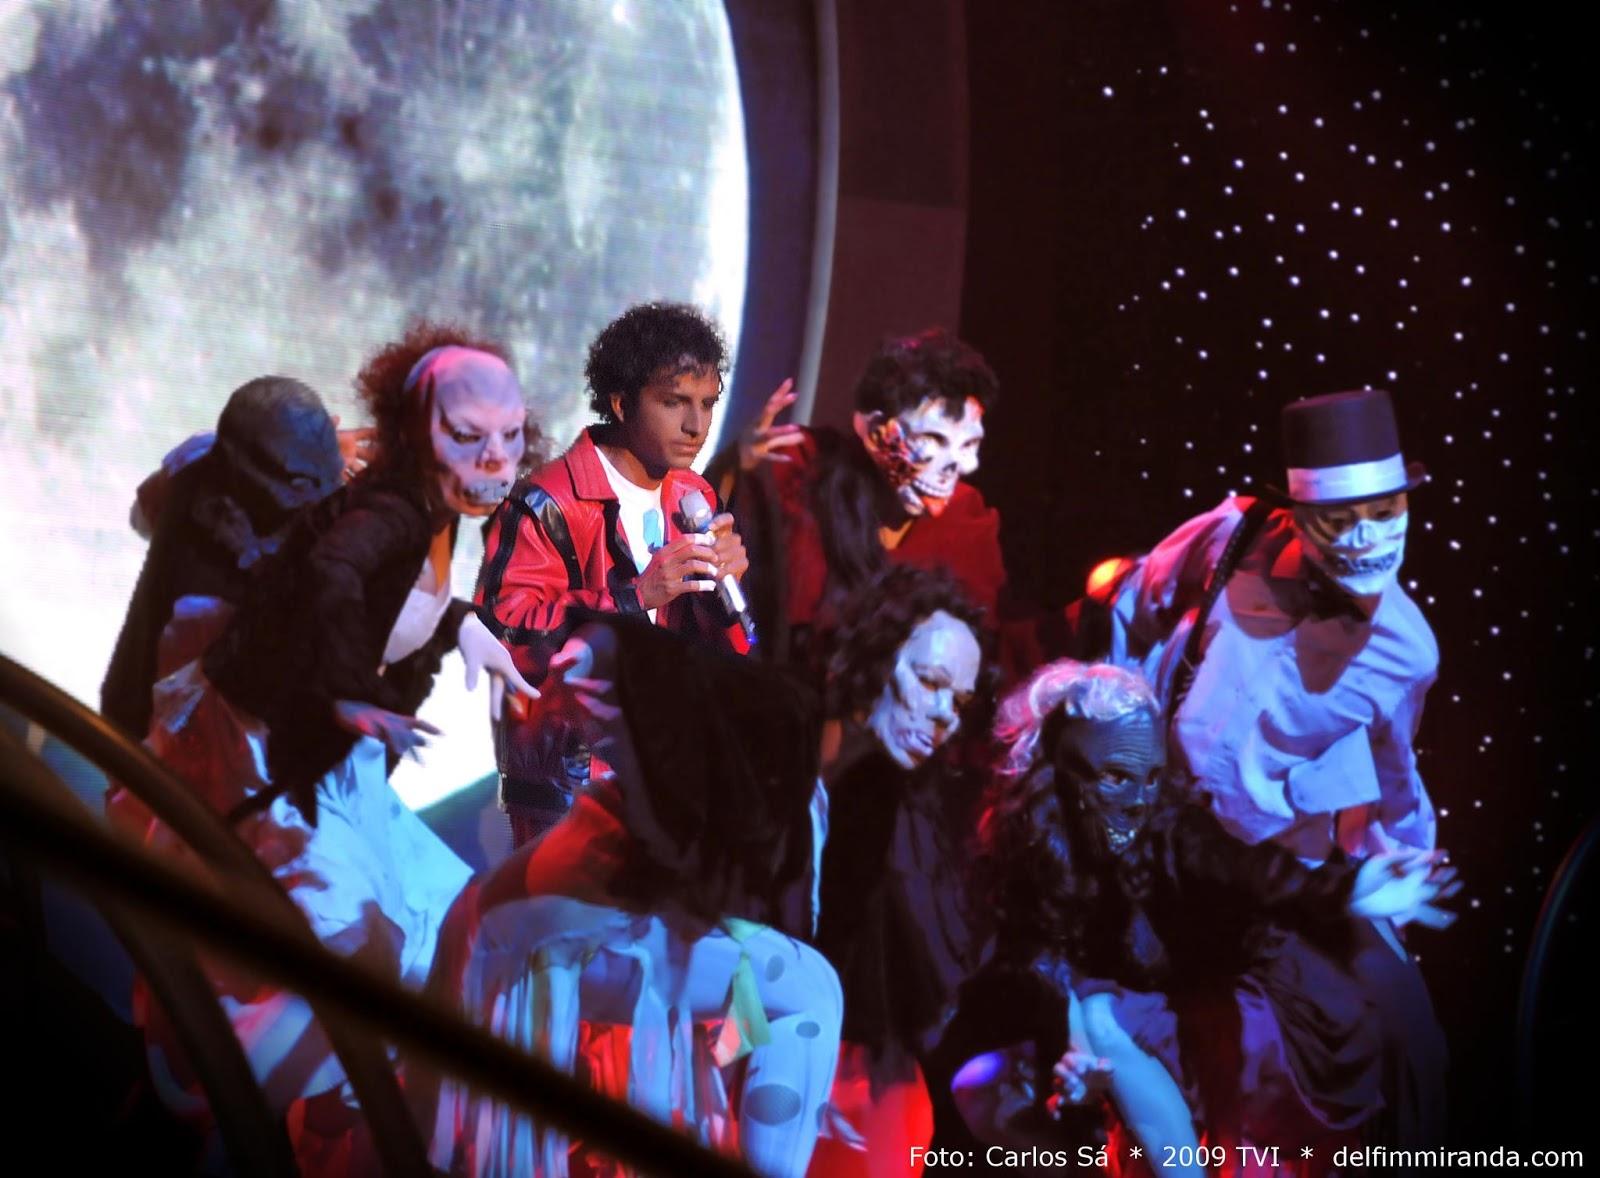 Delfim Miranda - Michael Jackson Tribute - Back to the 80's with Thriller - TV performance - TVI / Endemol